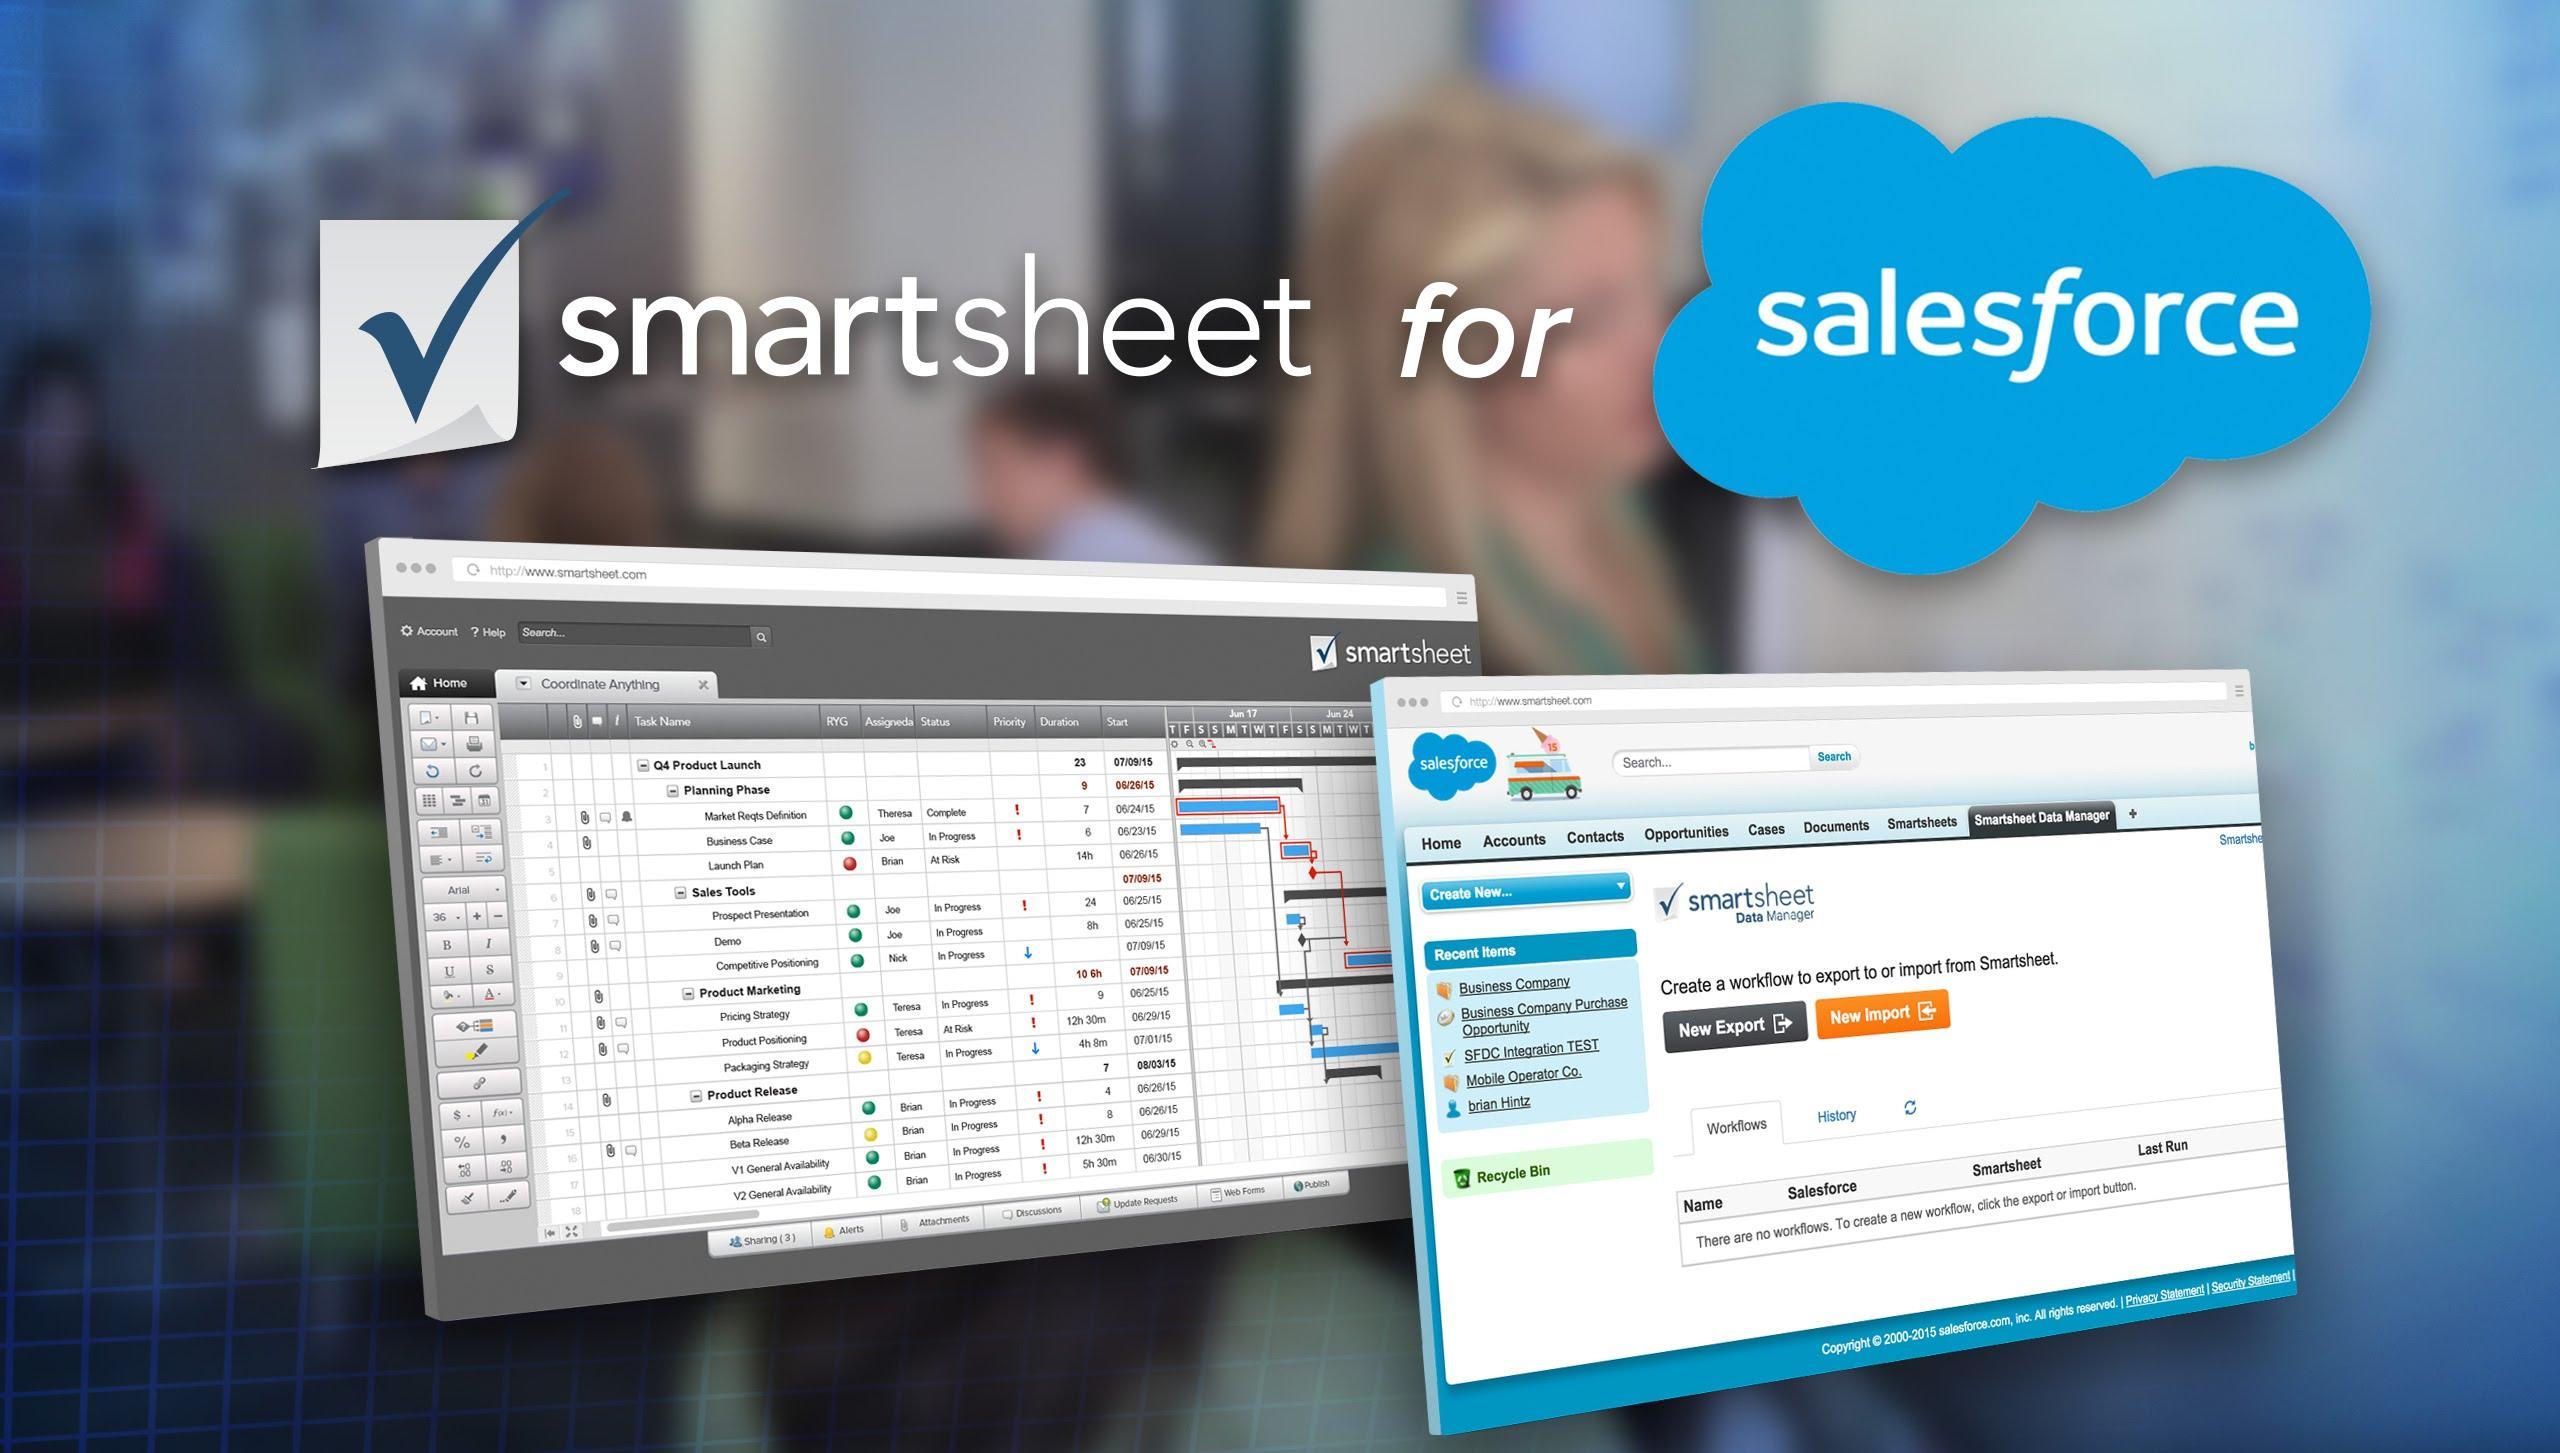 Smartsheet for Salesforce